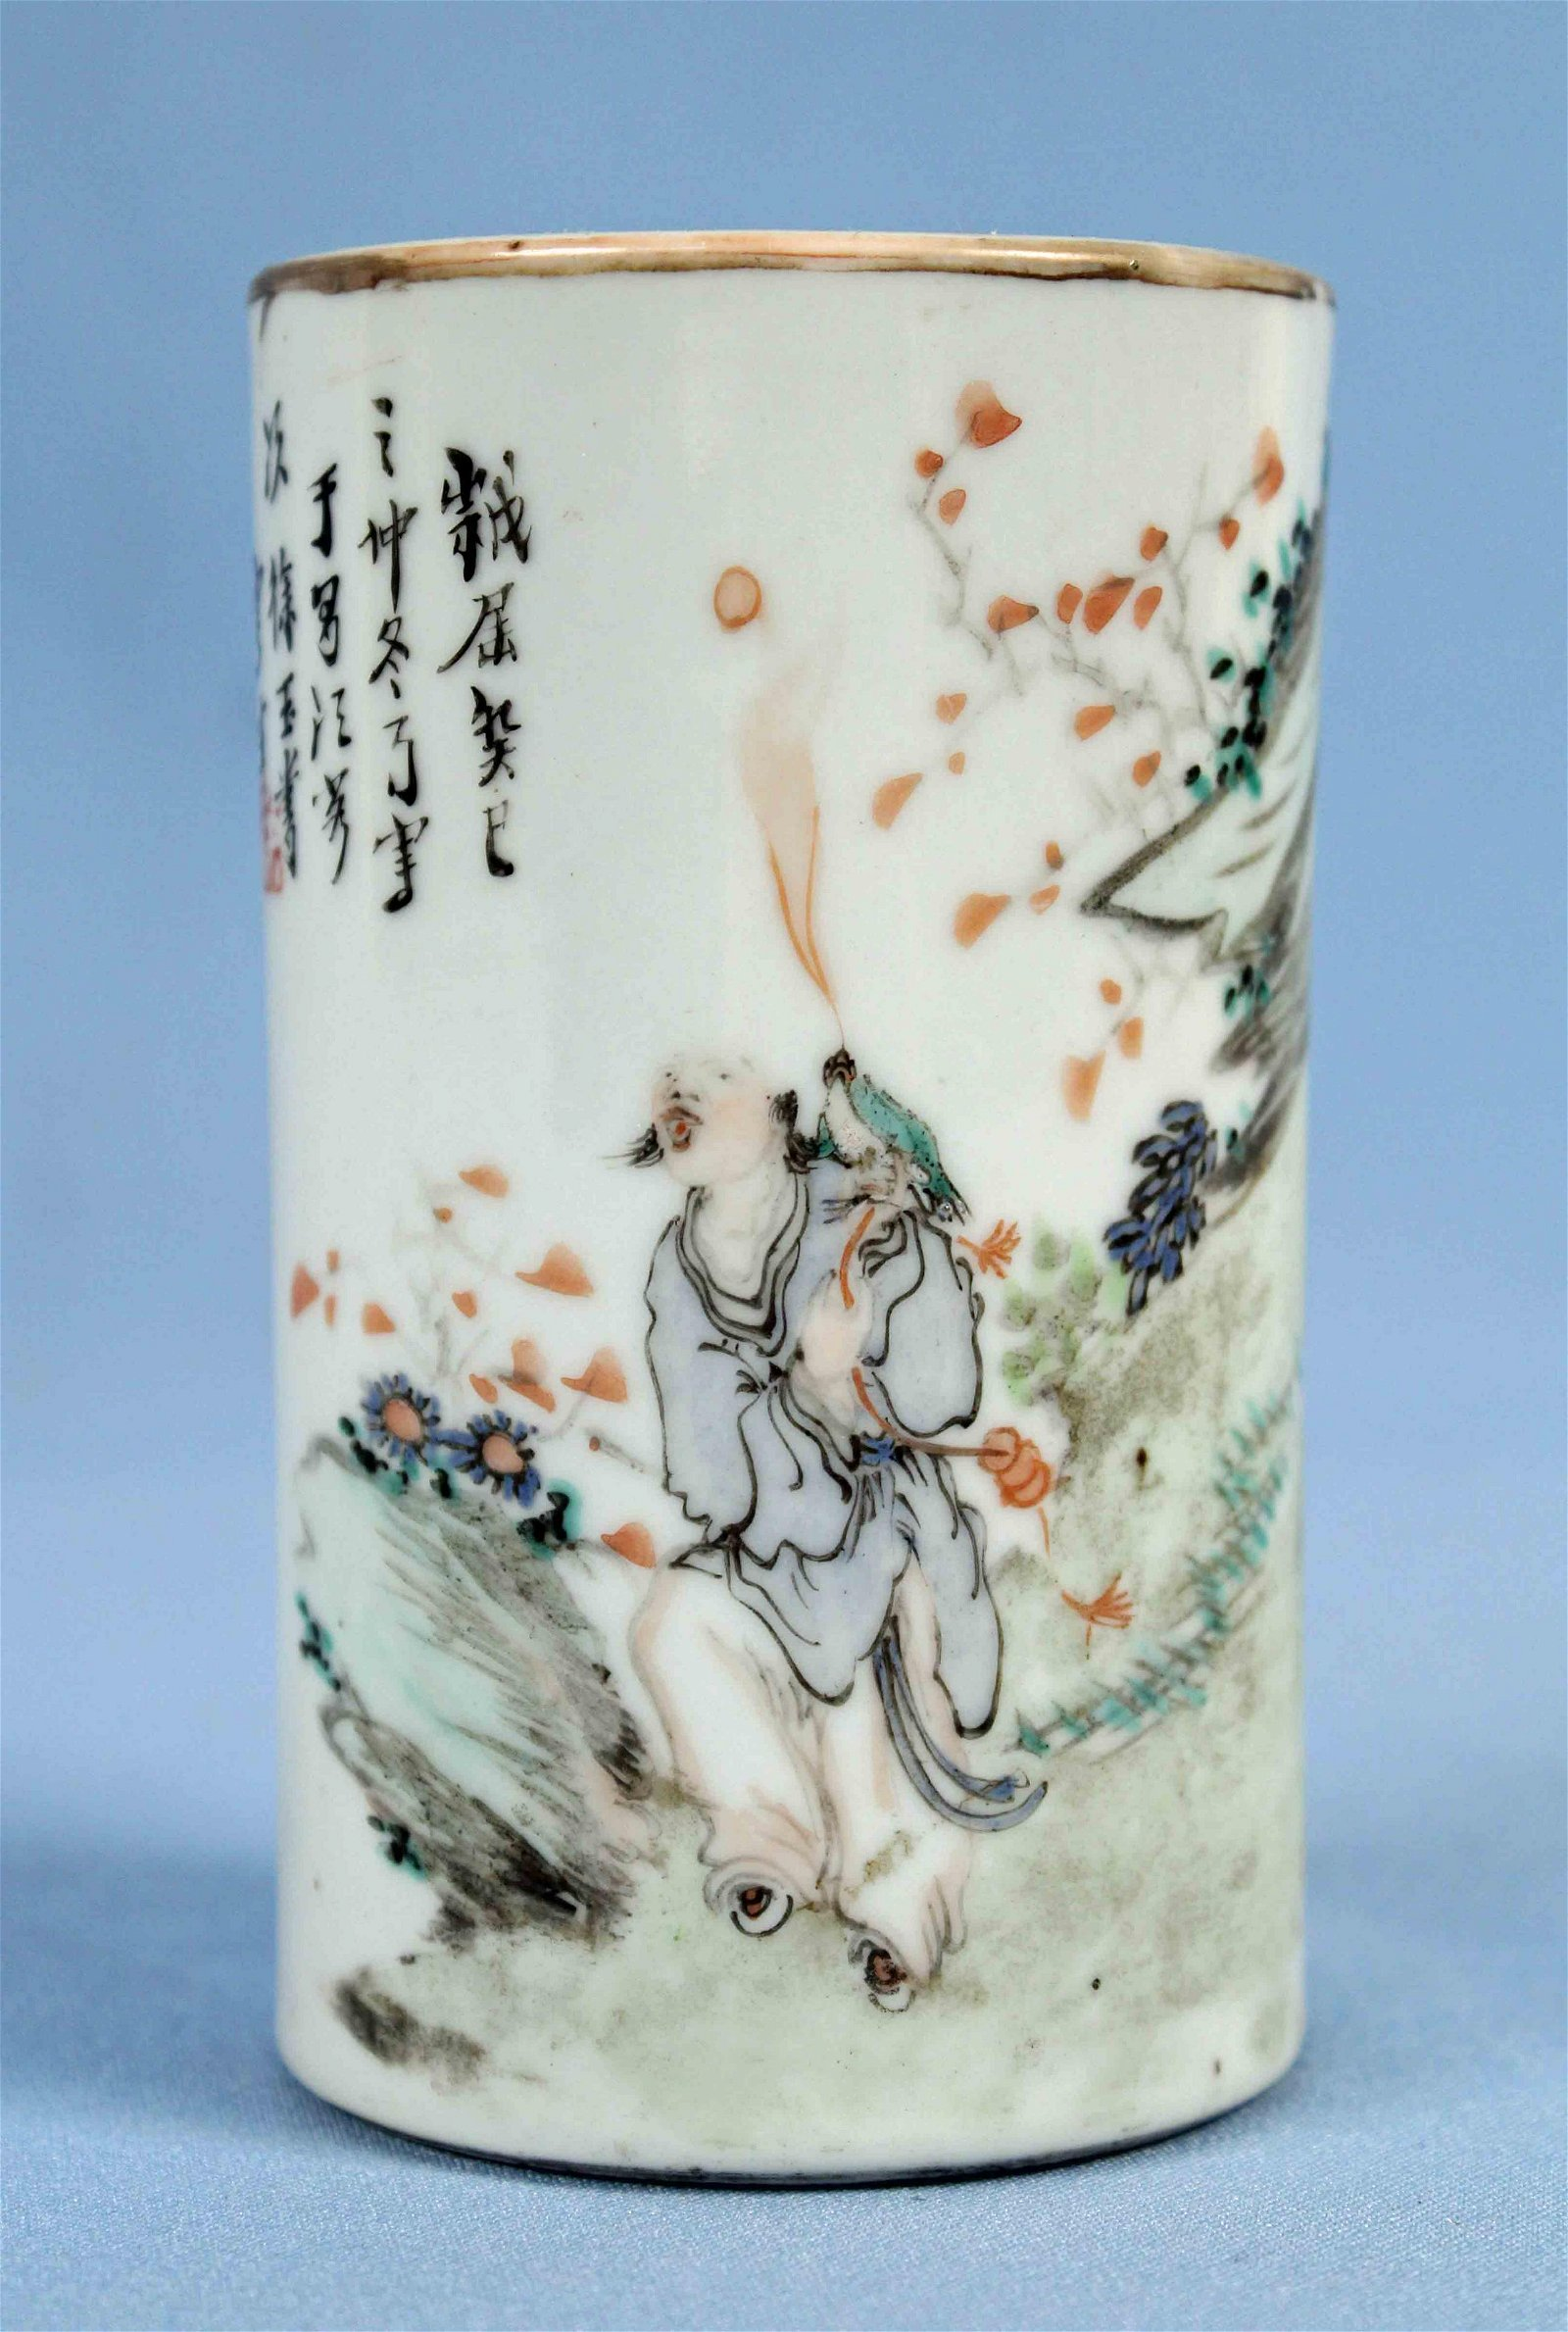 19th/20th C. Chinese Porcelain Brush Pot